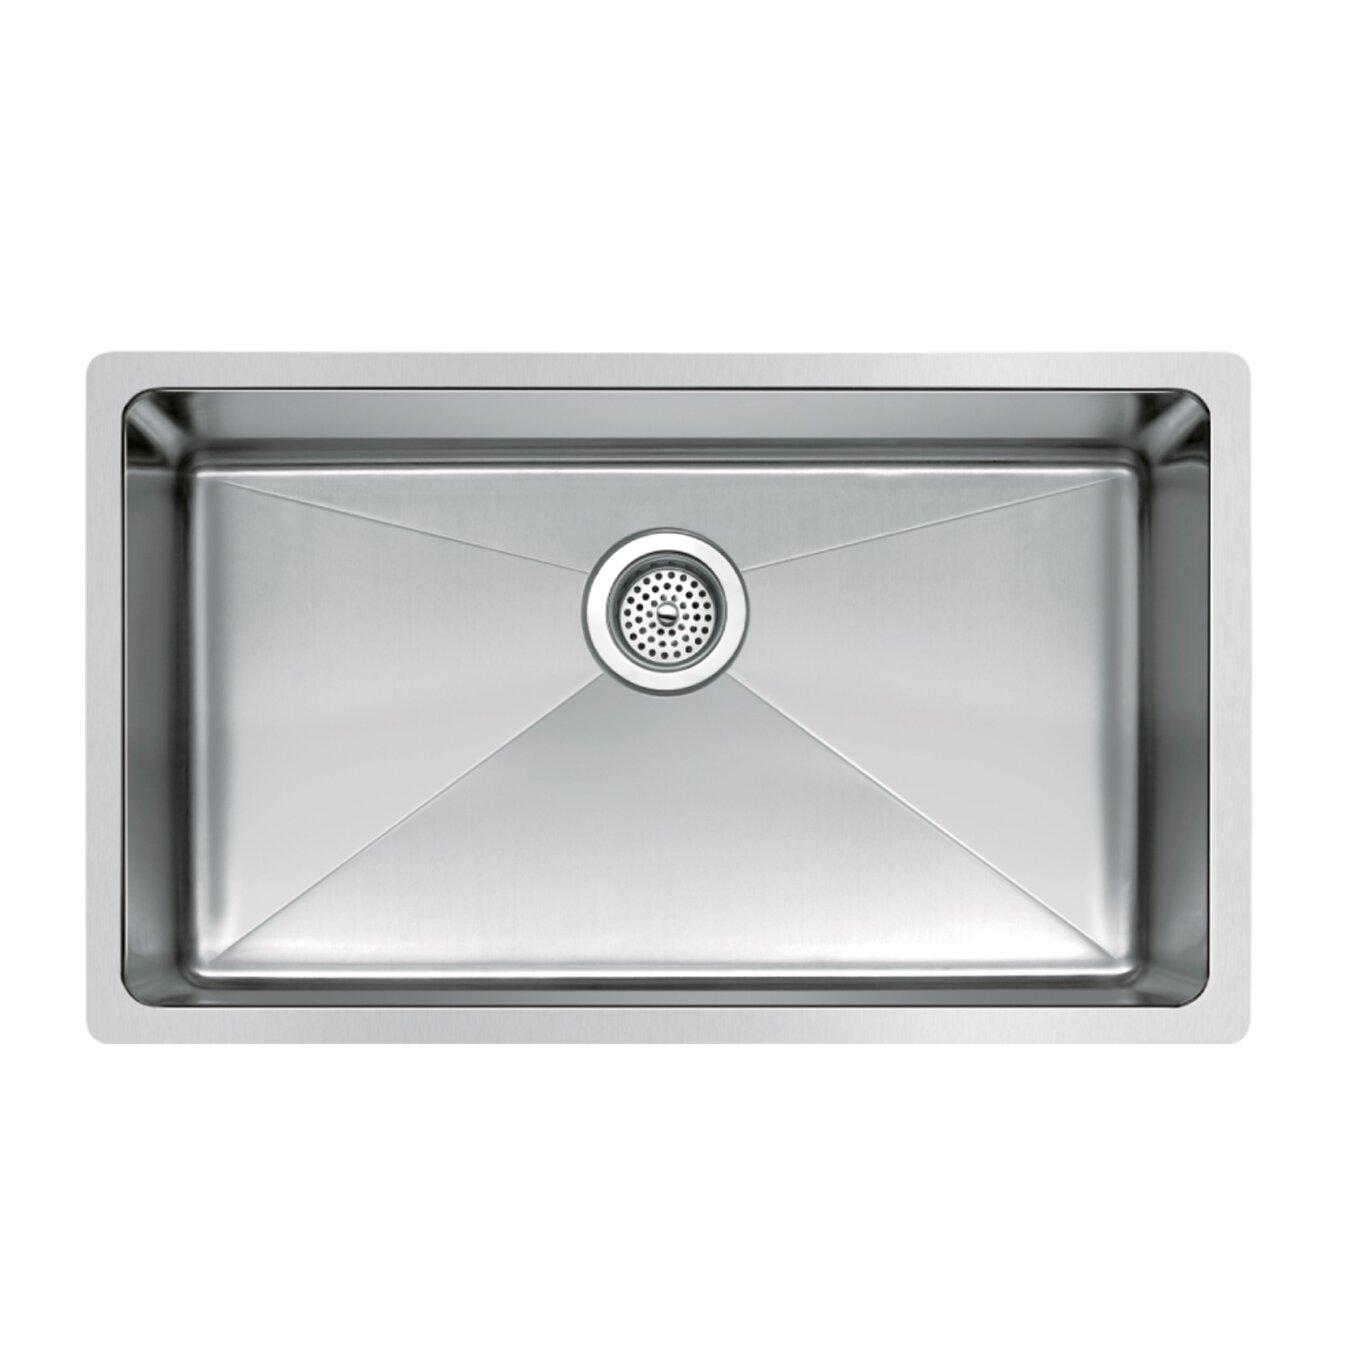 dCOR design Brier Single Bowl Kitchen Sink DCRN single bowl kitchen sink dCOR design Brier Single Bowl Kitchen Sink